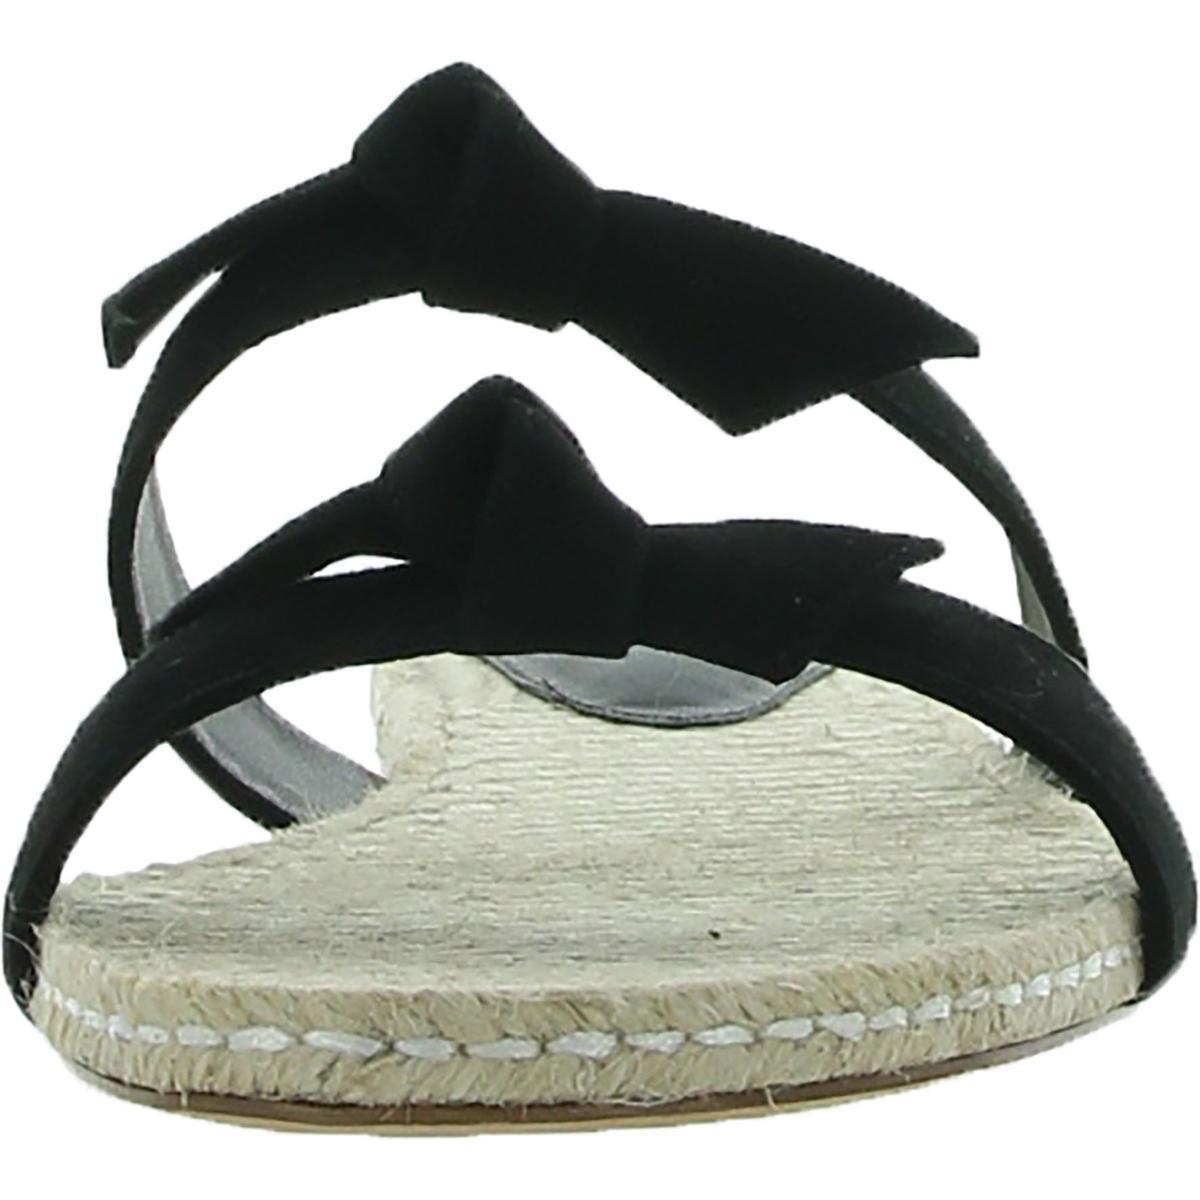 thumbnail 5 - Alexandre Birman Womens Clarita Leather Flats Slide Sandals Shoes BHFO 6244